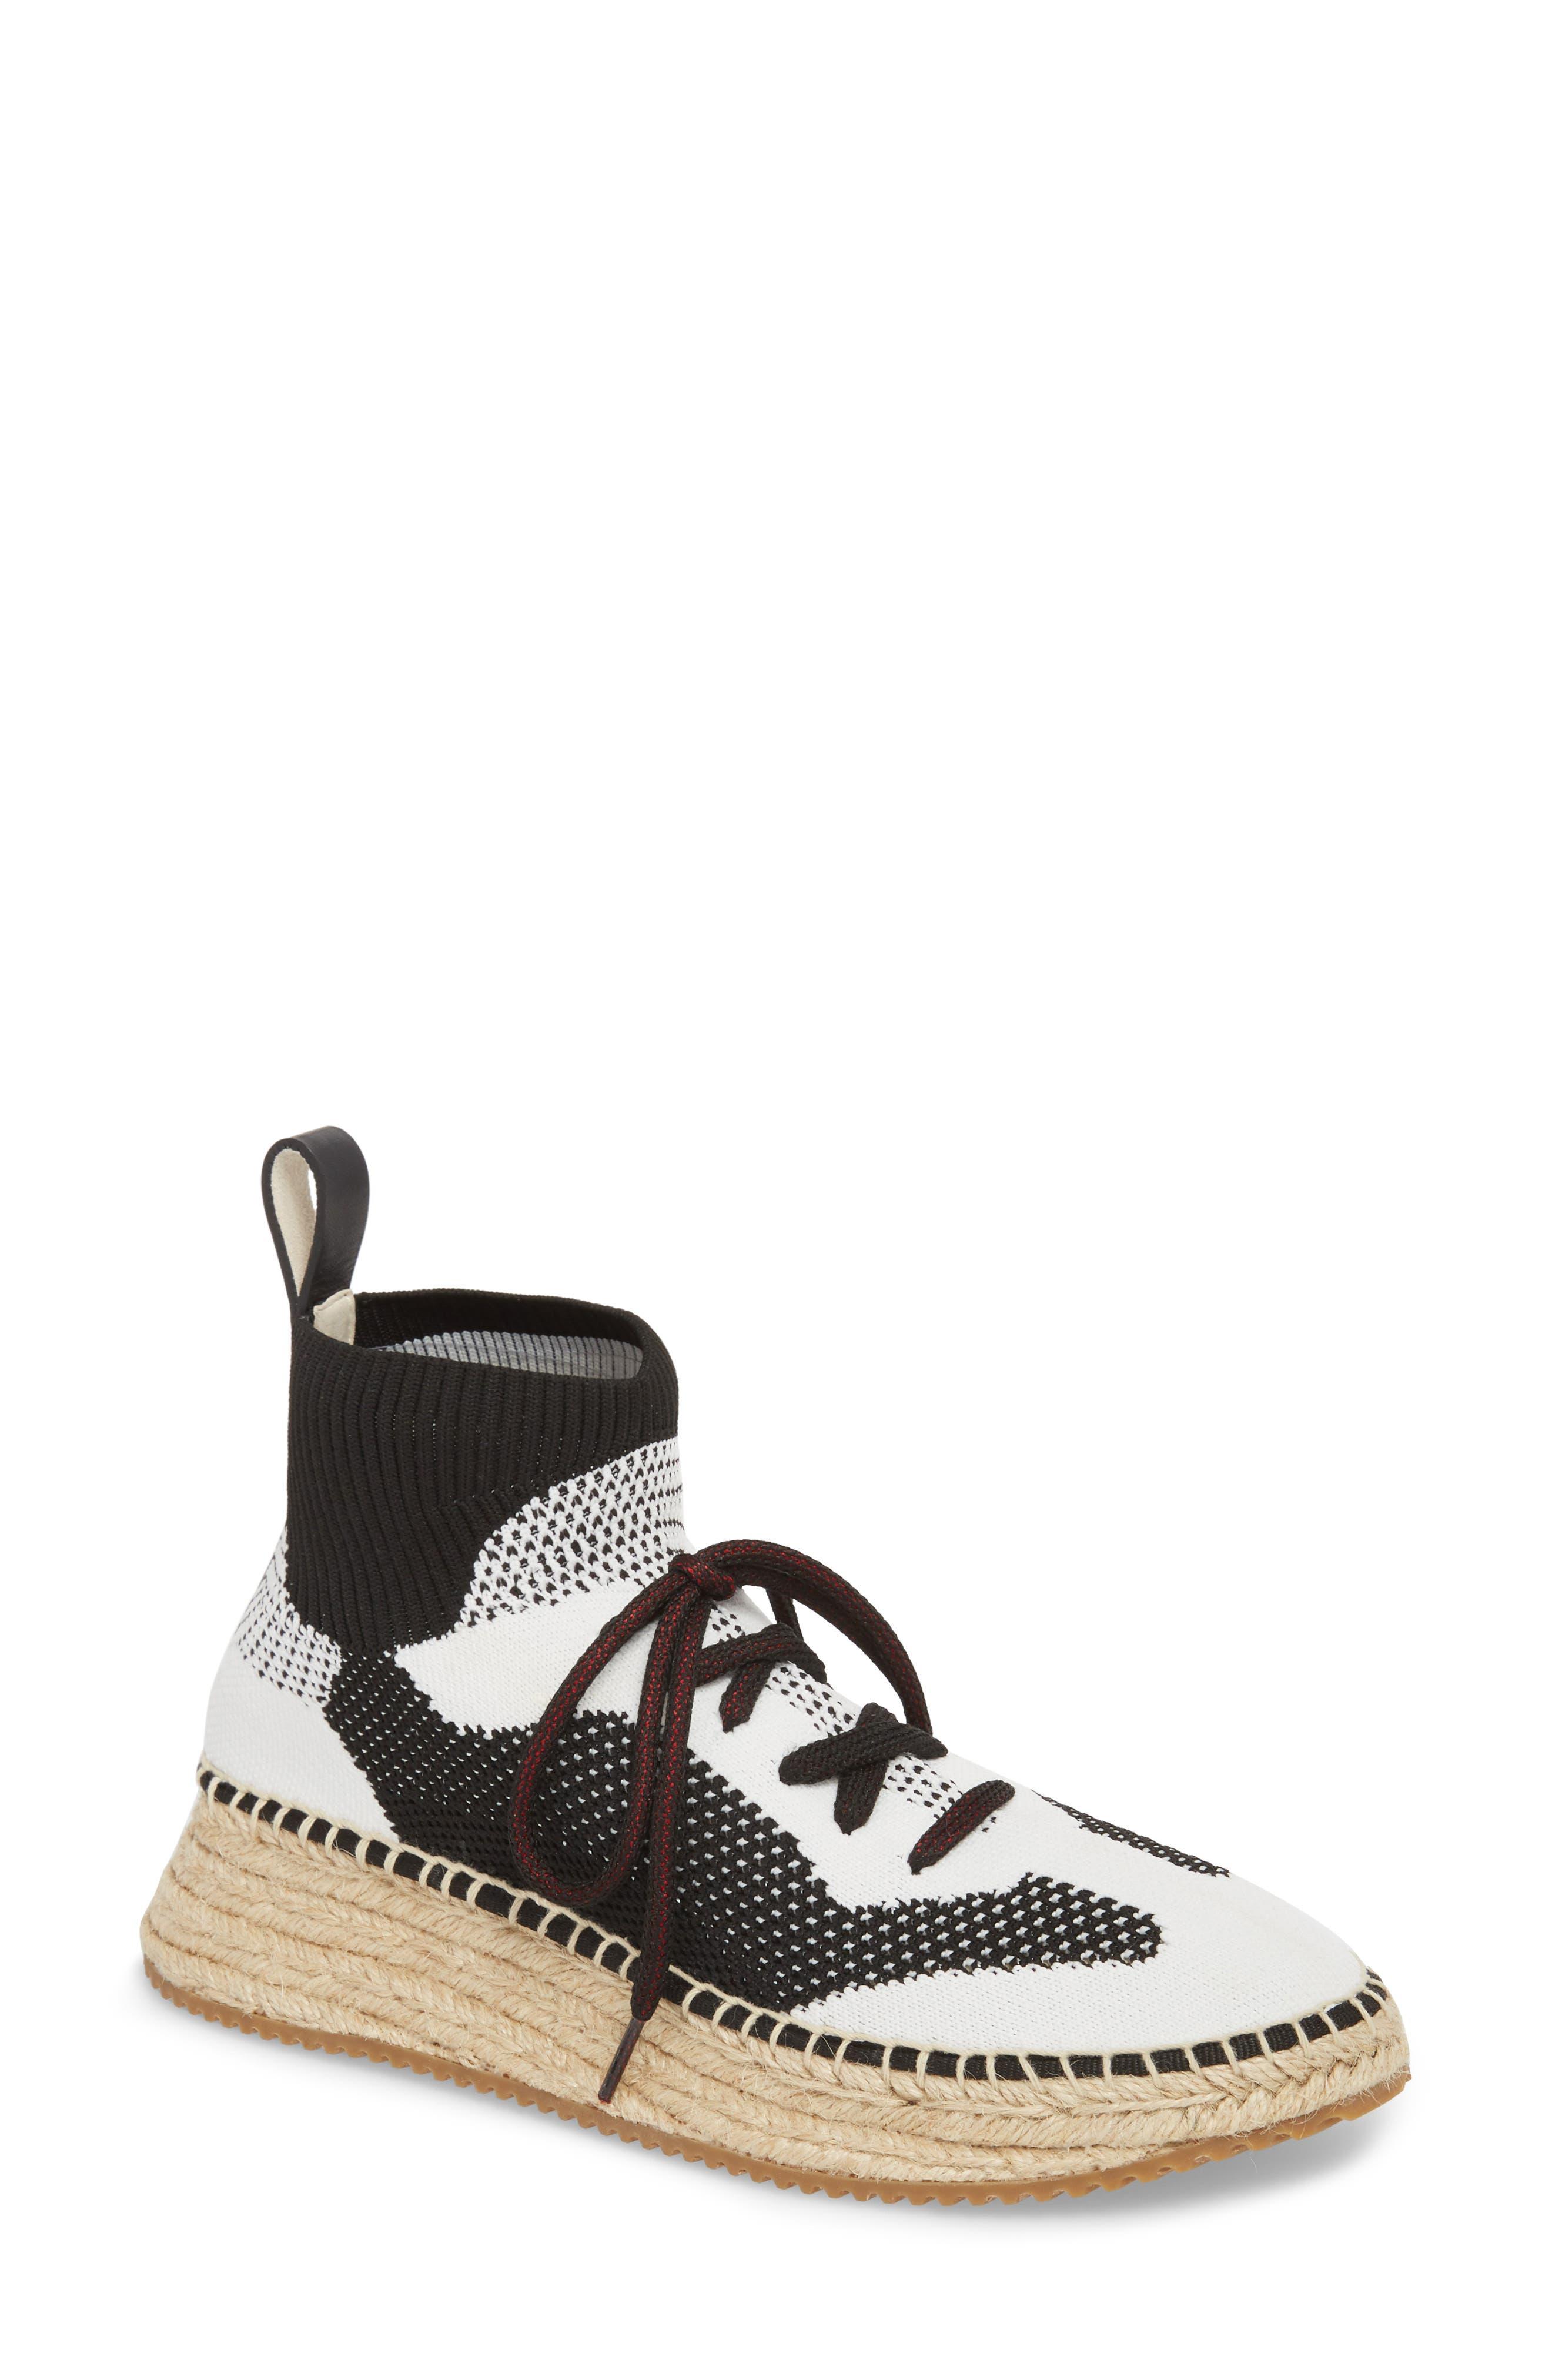 Dakota Espadrille Sock Sneaker,                         Main,                         color,